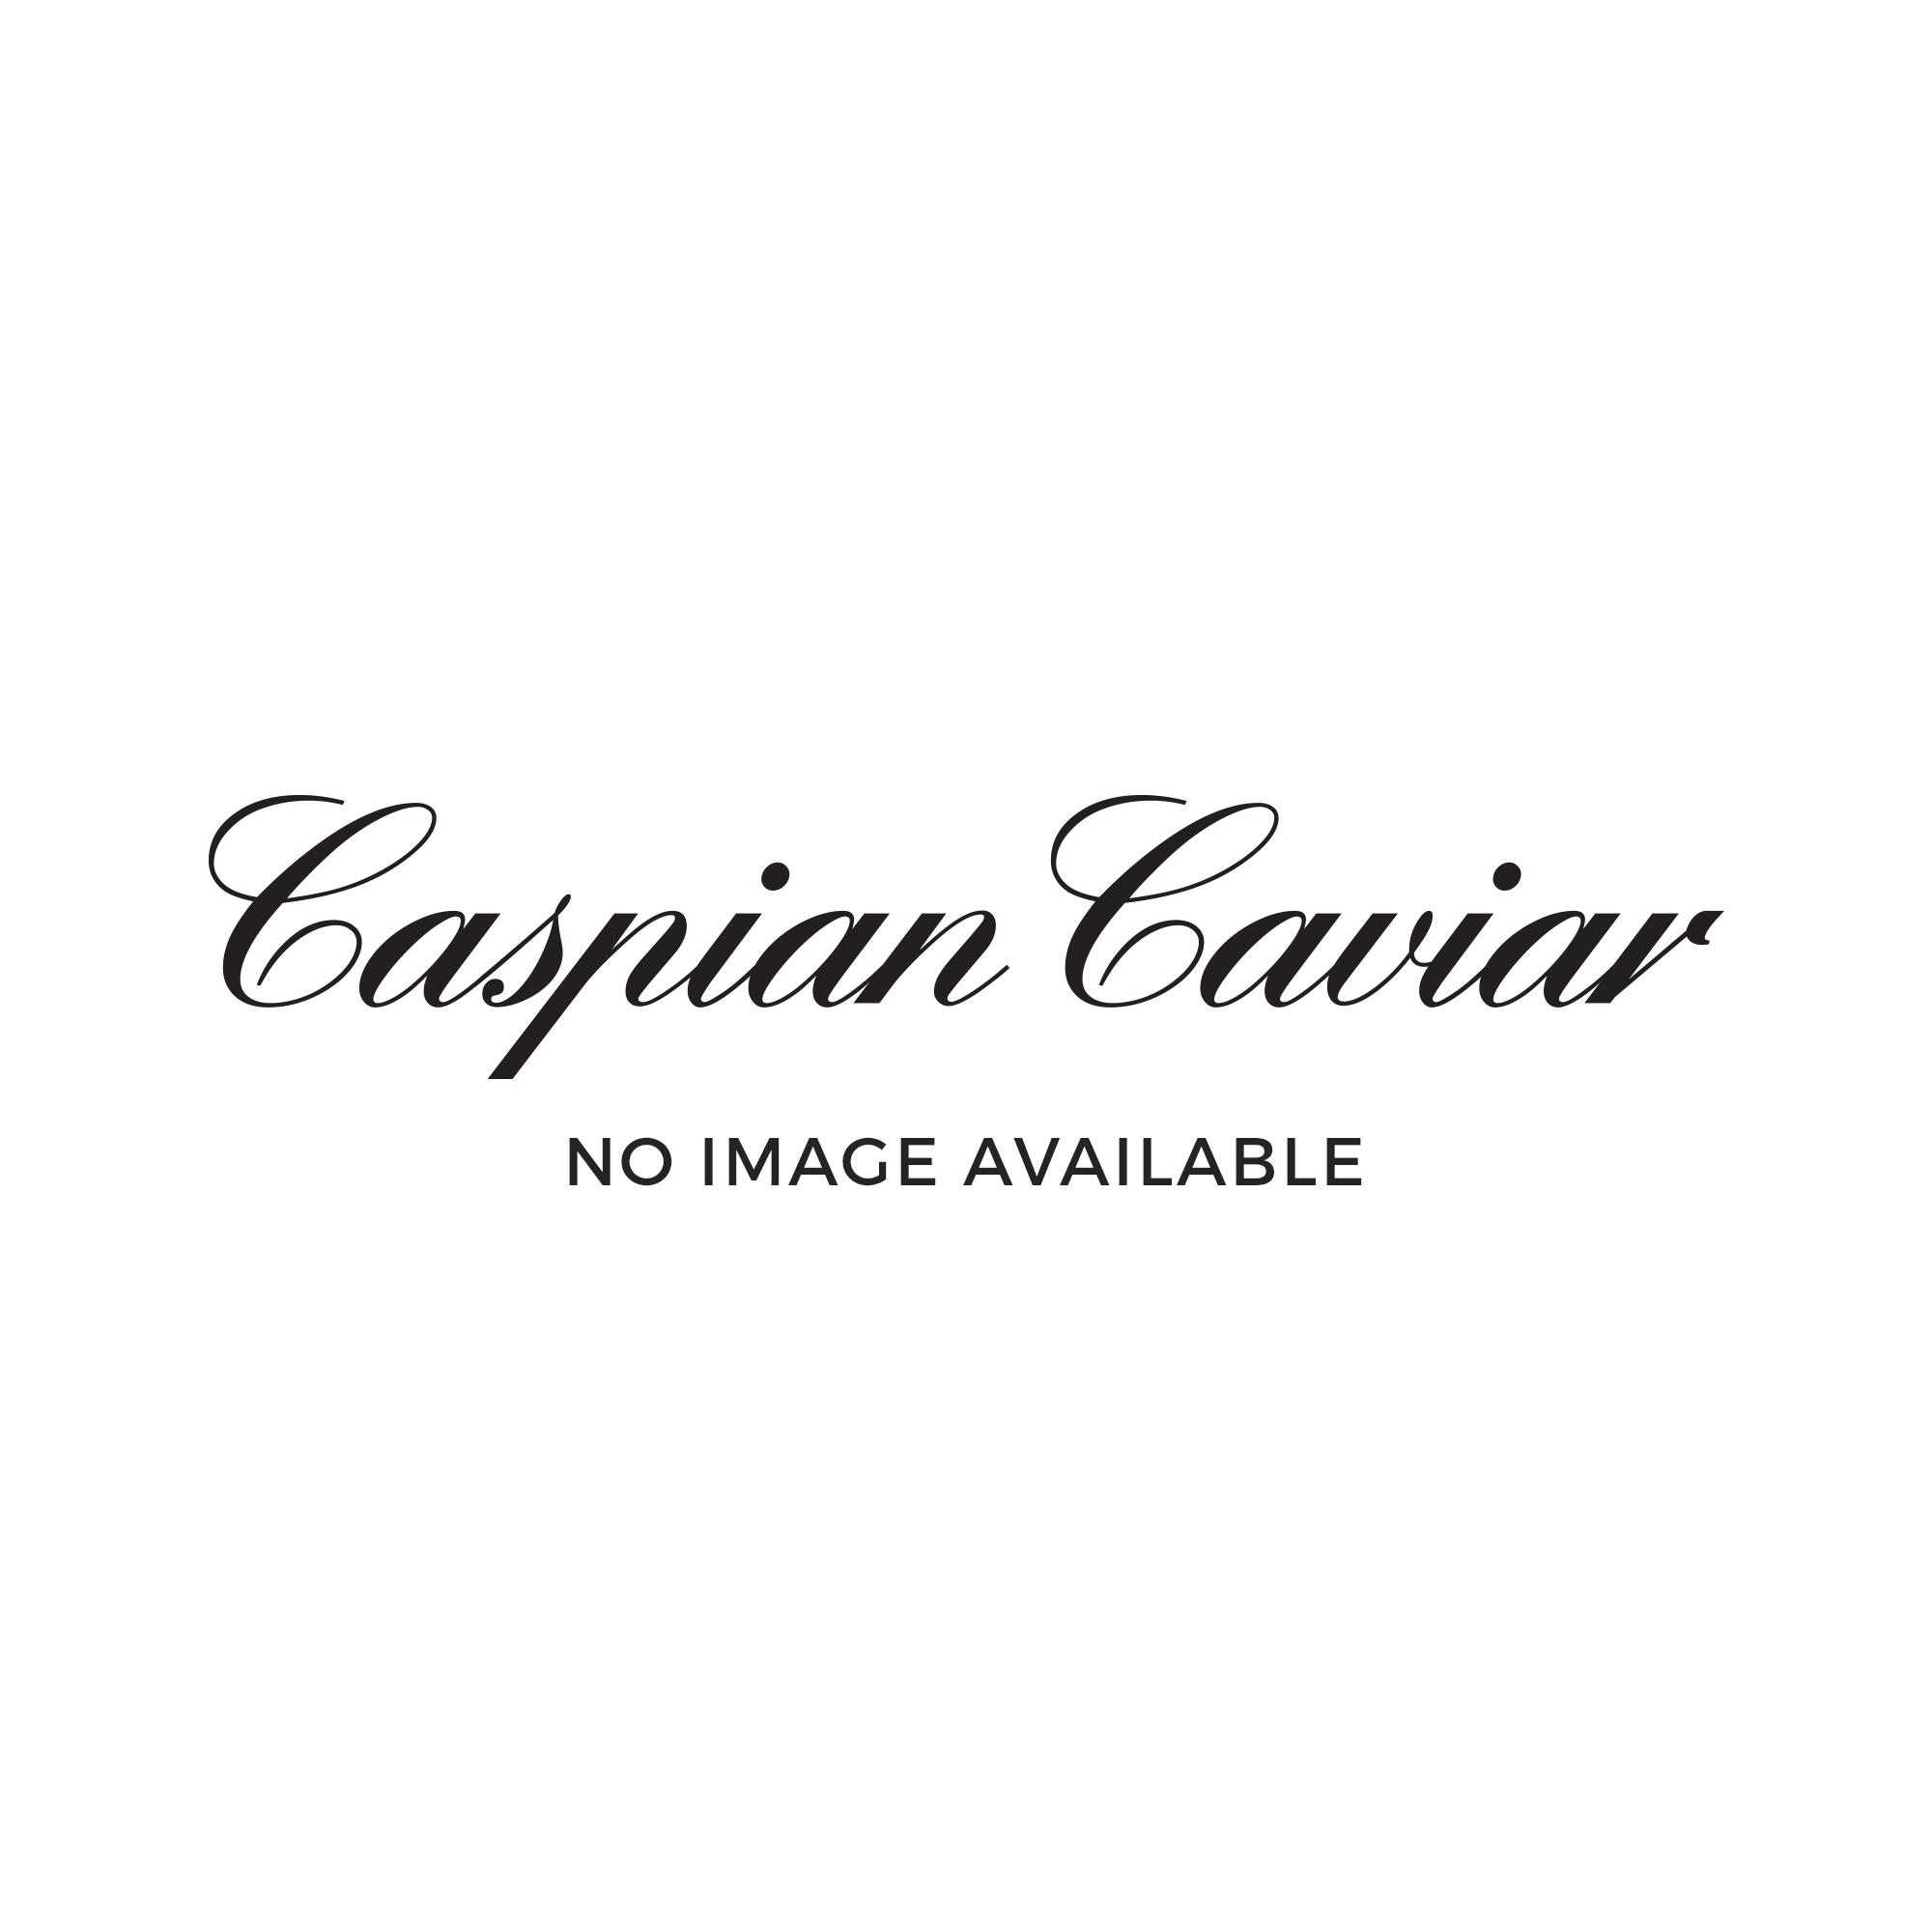 Caspian Caviar Chocolates & Champagne Gift Set